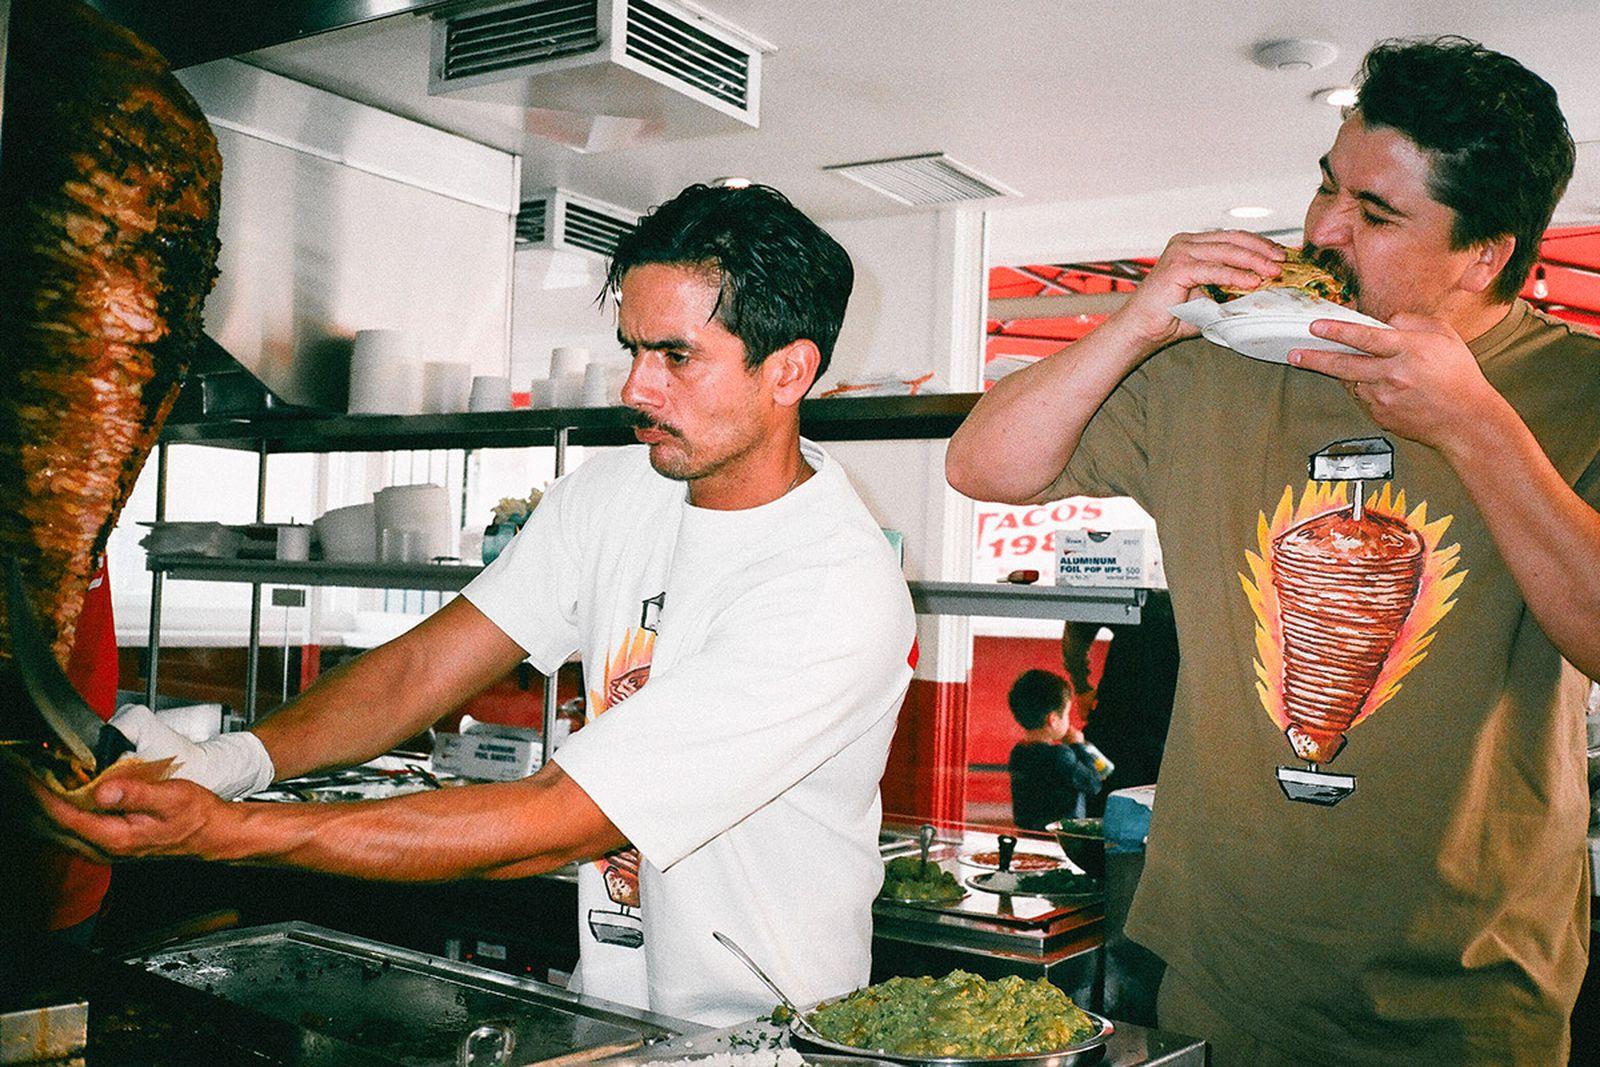 tacos-1986-x-hm-blank-staples-09